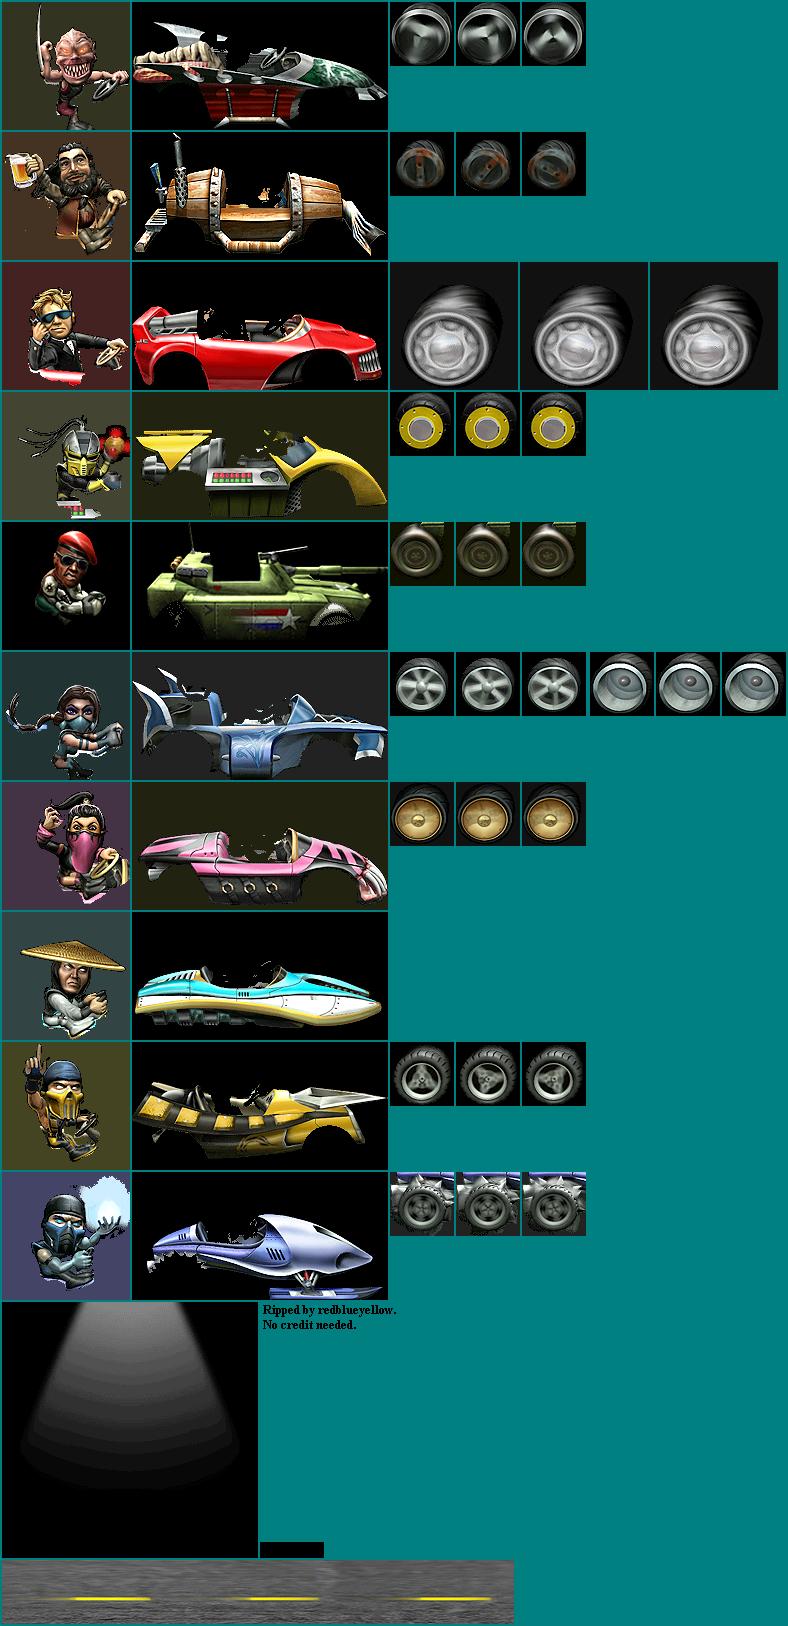 Wii - Mortal Kombat: Armageddon - Character Select - The Spriters